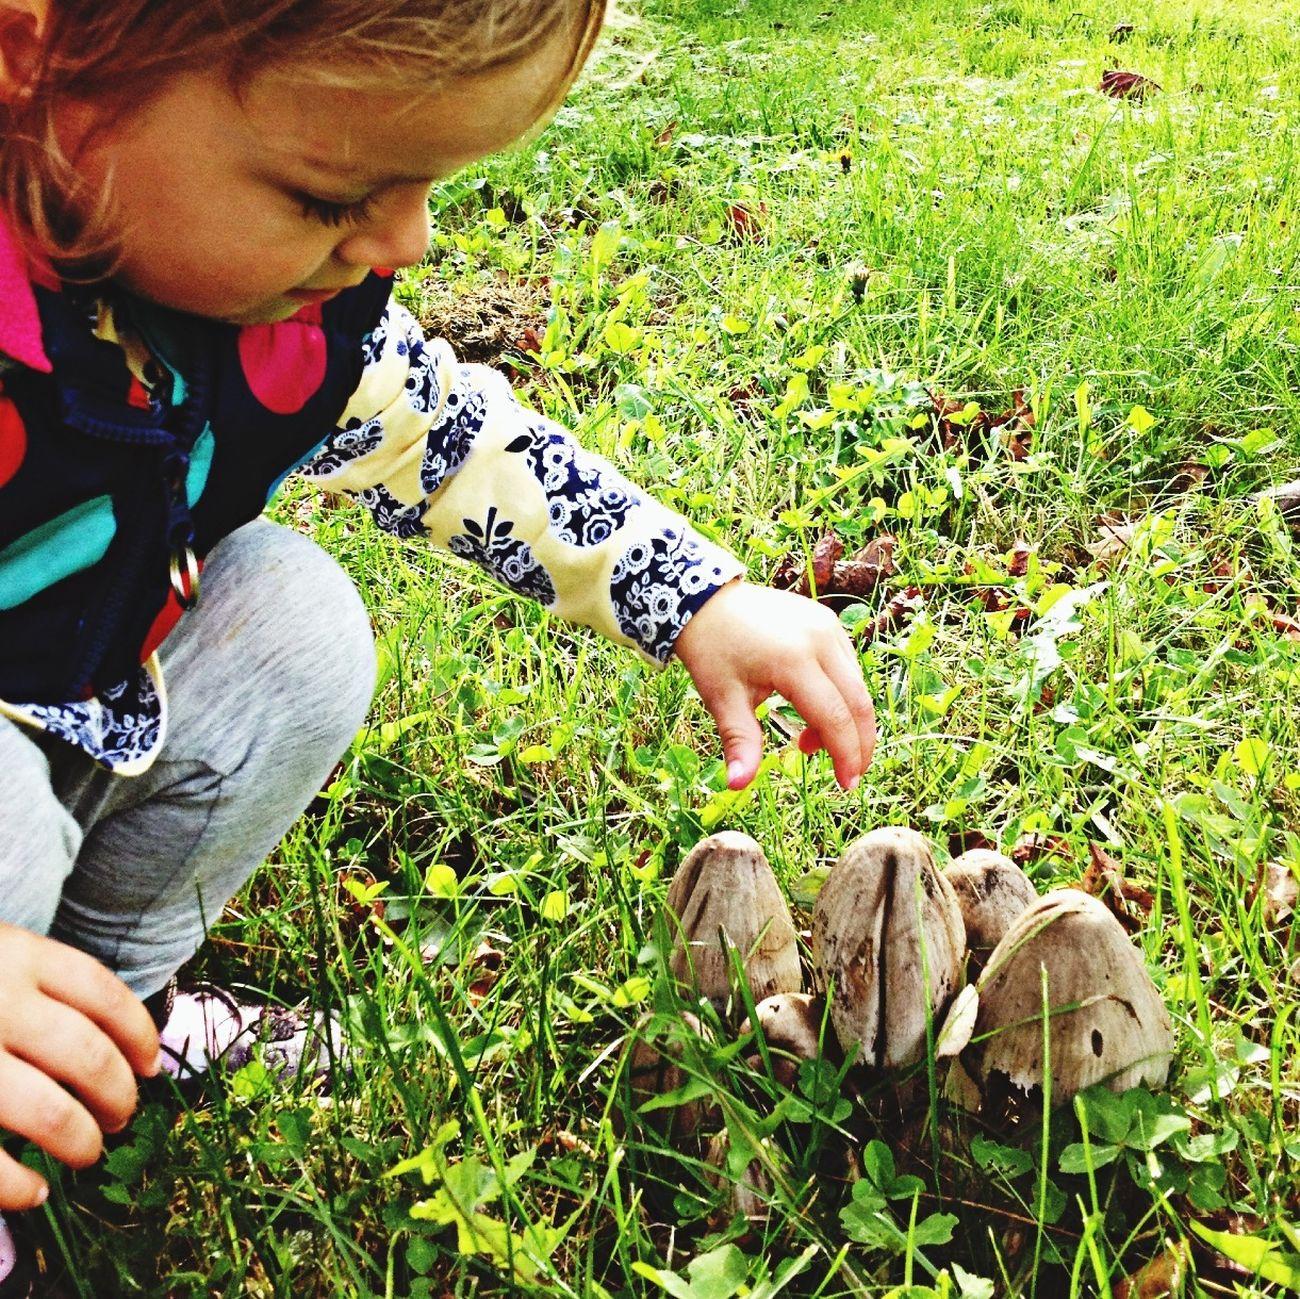 Nina and the mushrooms Nature Mushrooms